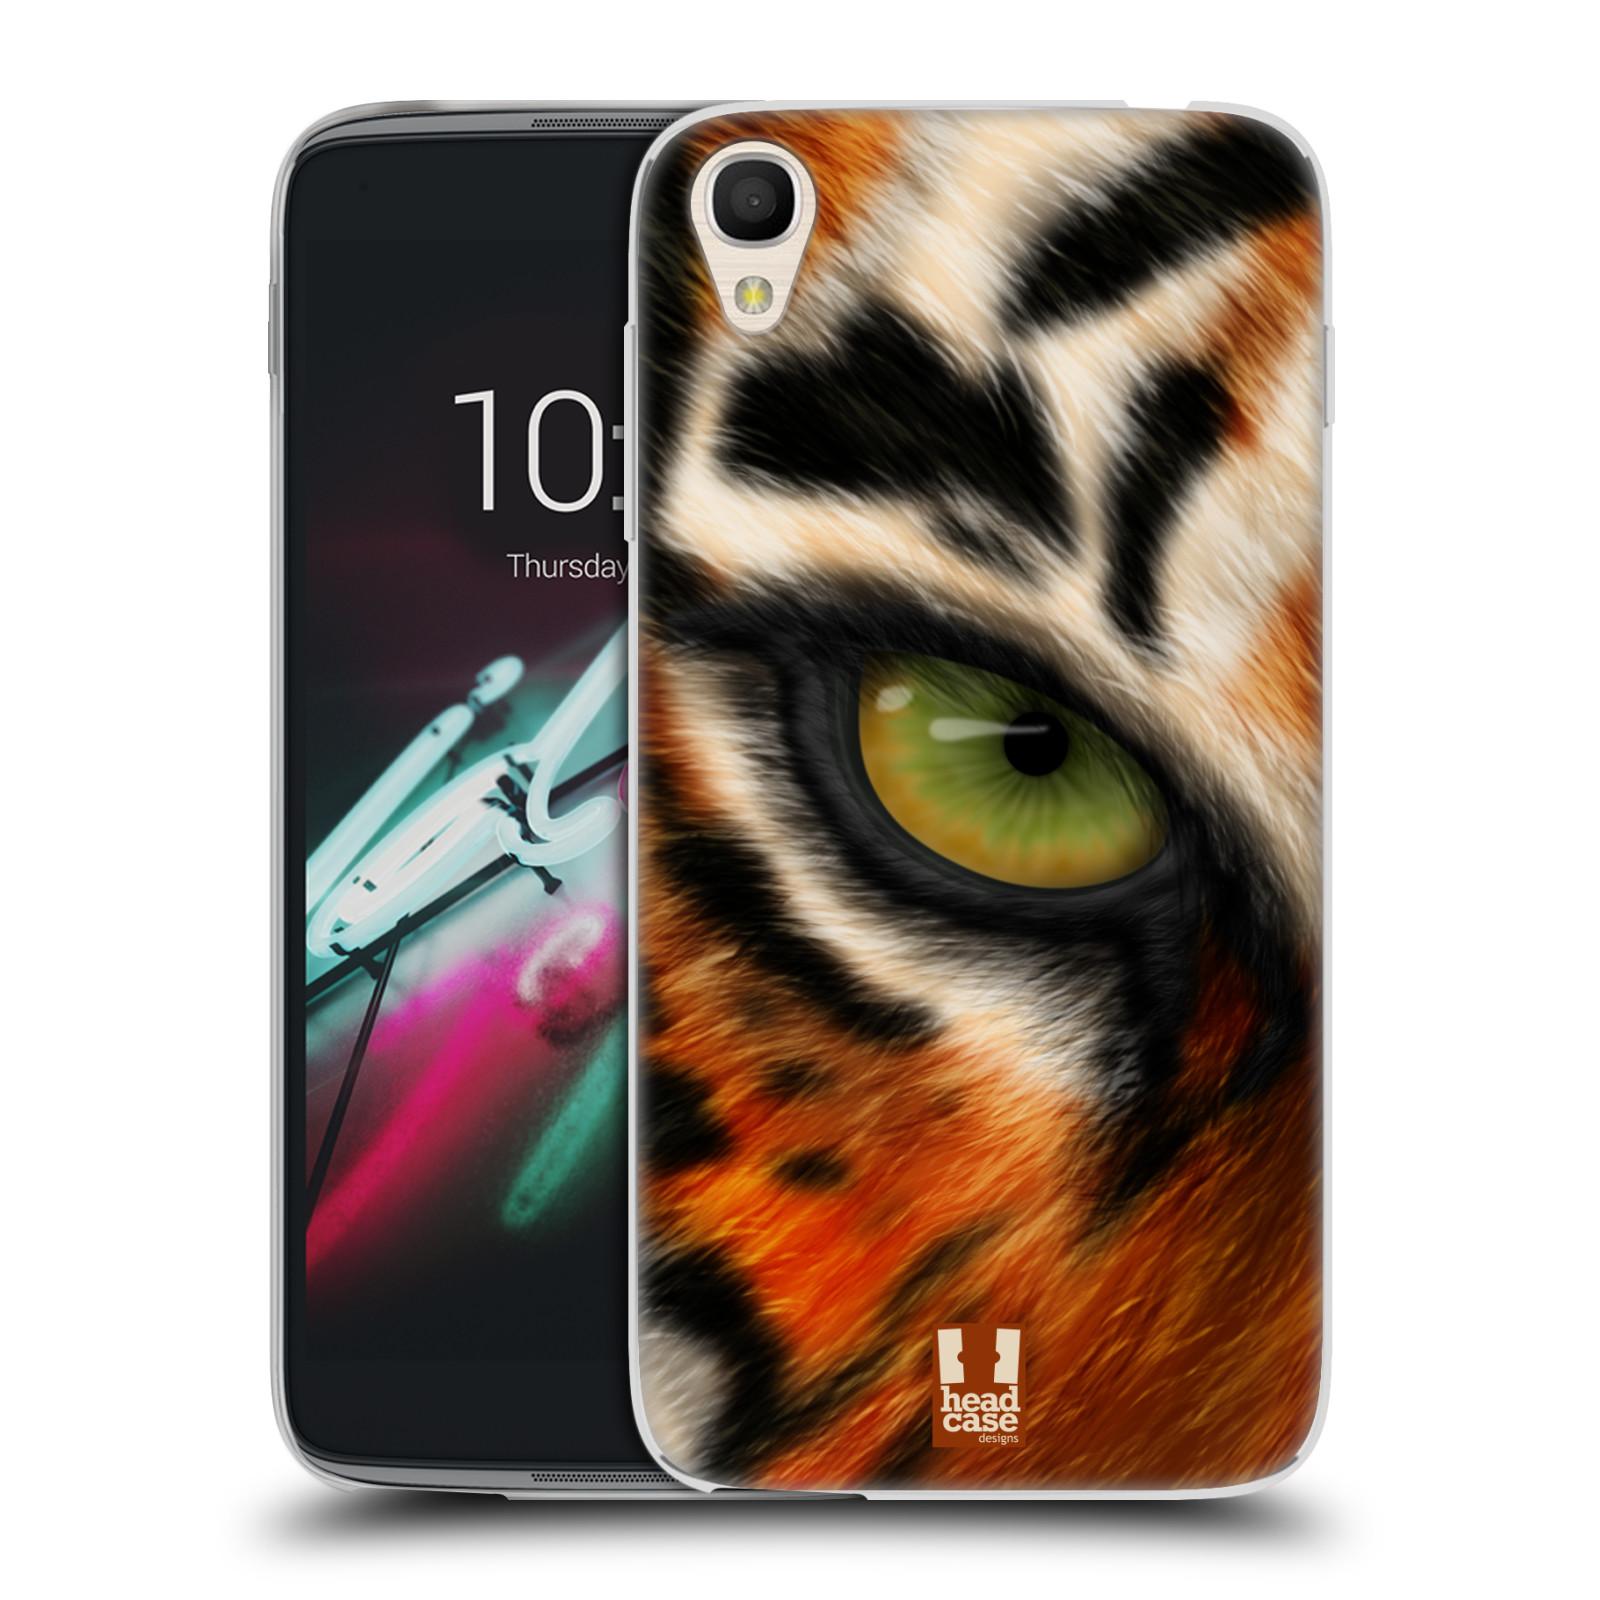 HEAD CASE silikonový obal na mobil Alcatel Idol 3 OT-6039Y (4.7) vzor pohled zvířete oko tygr